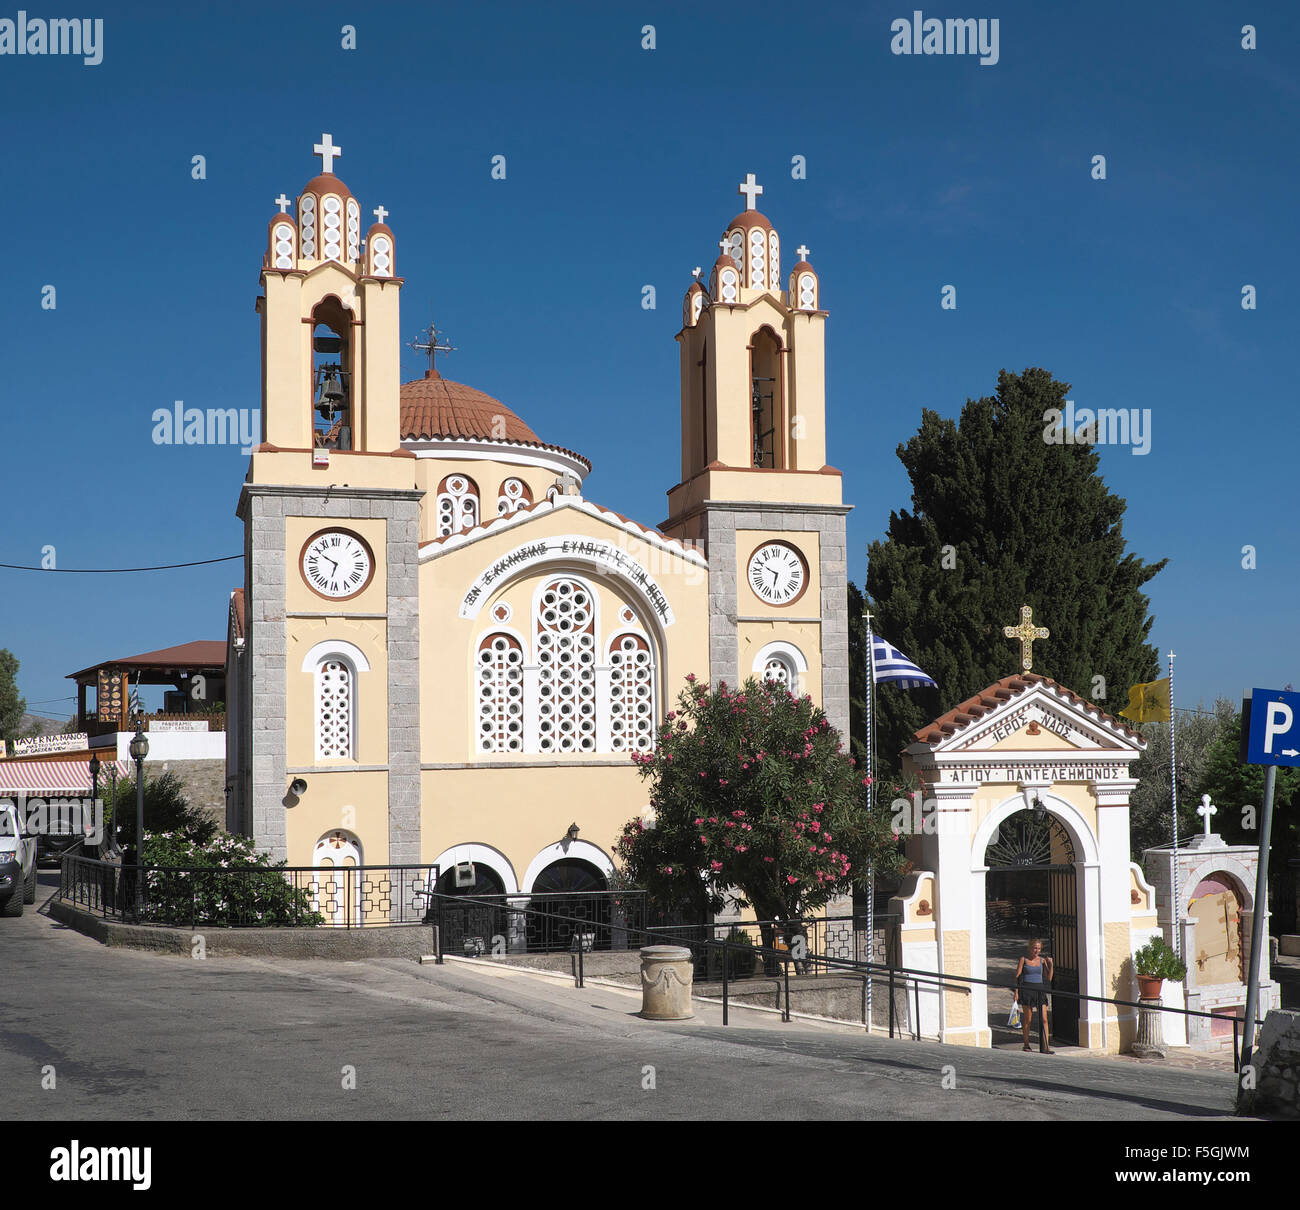 Siana church, Rhodes, Dodecanese, Greece - Stock Image